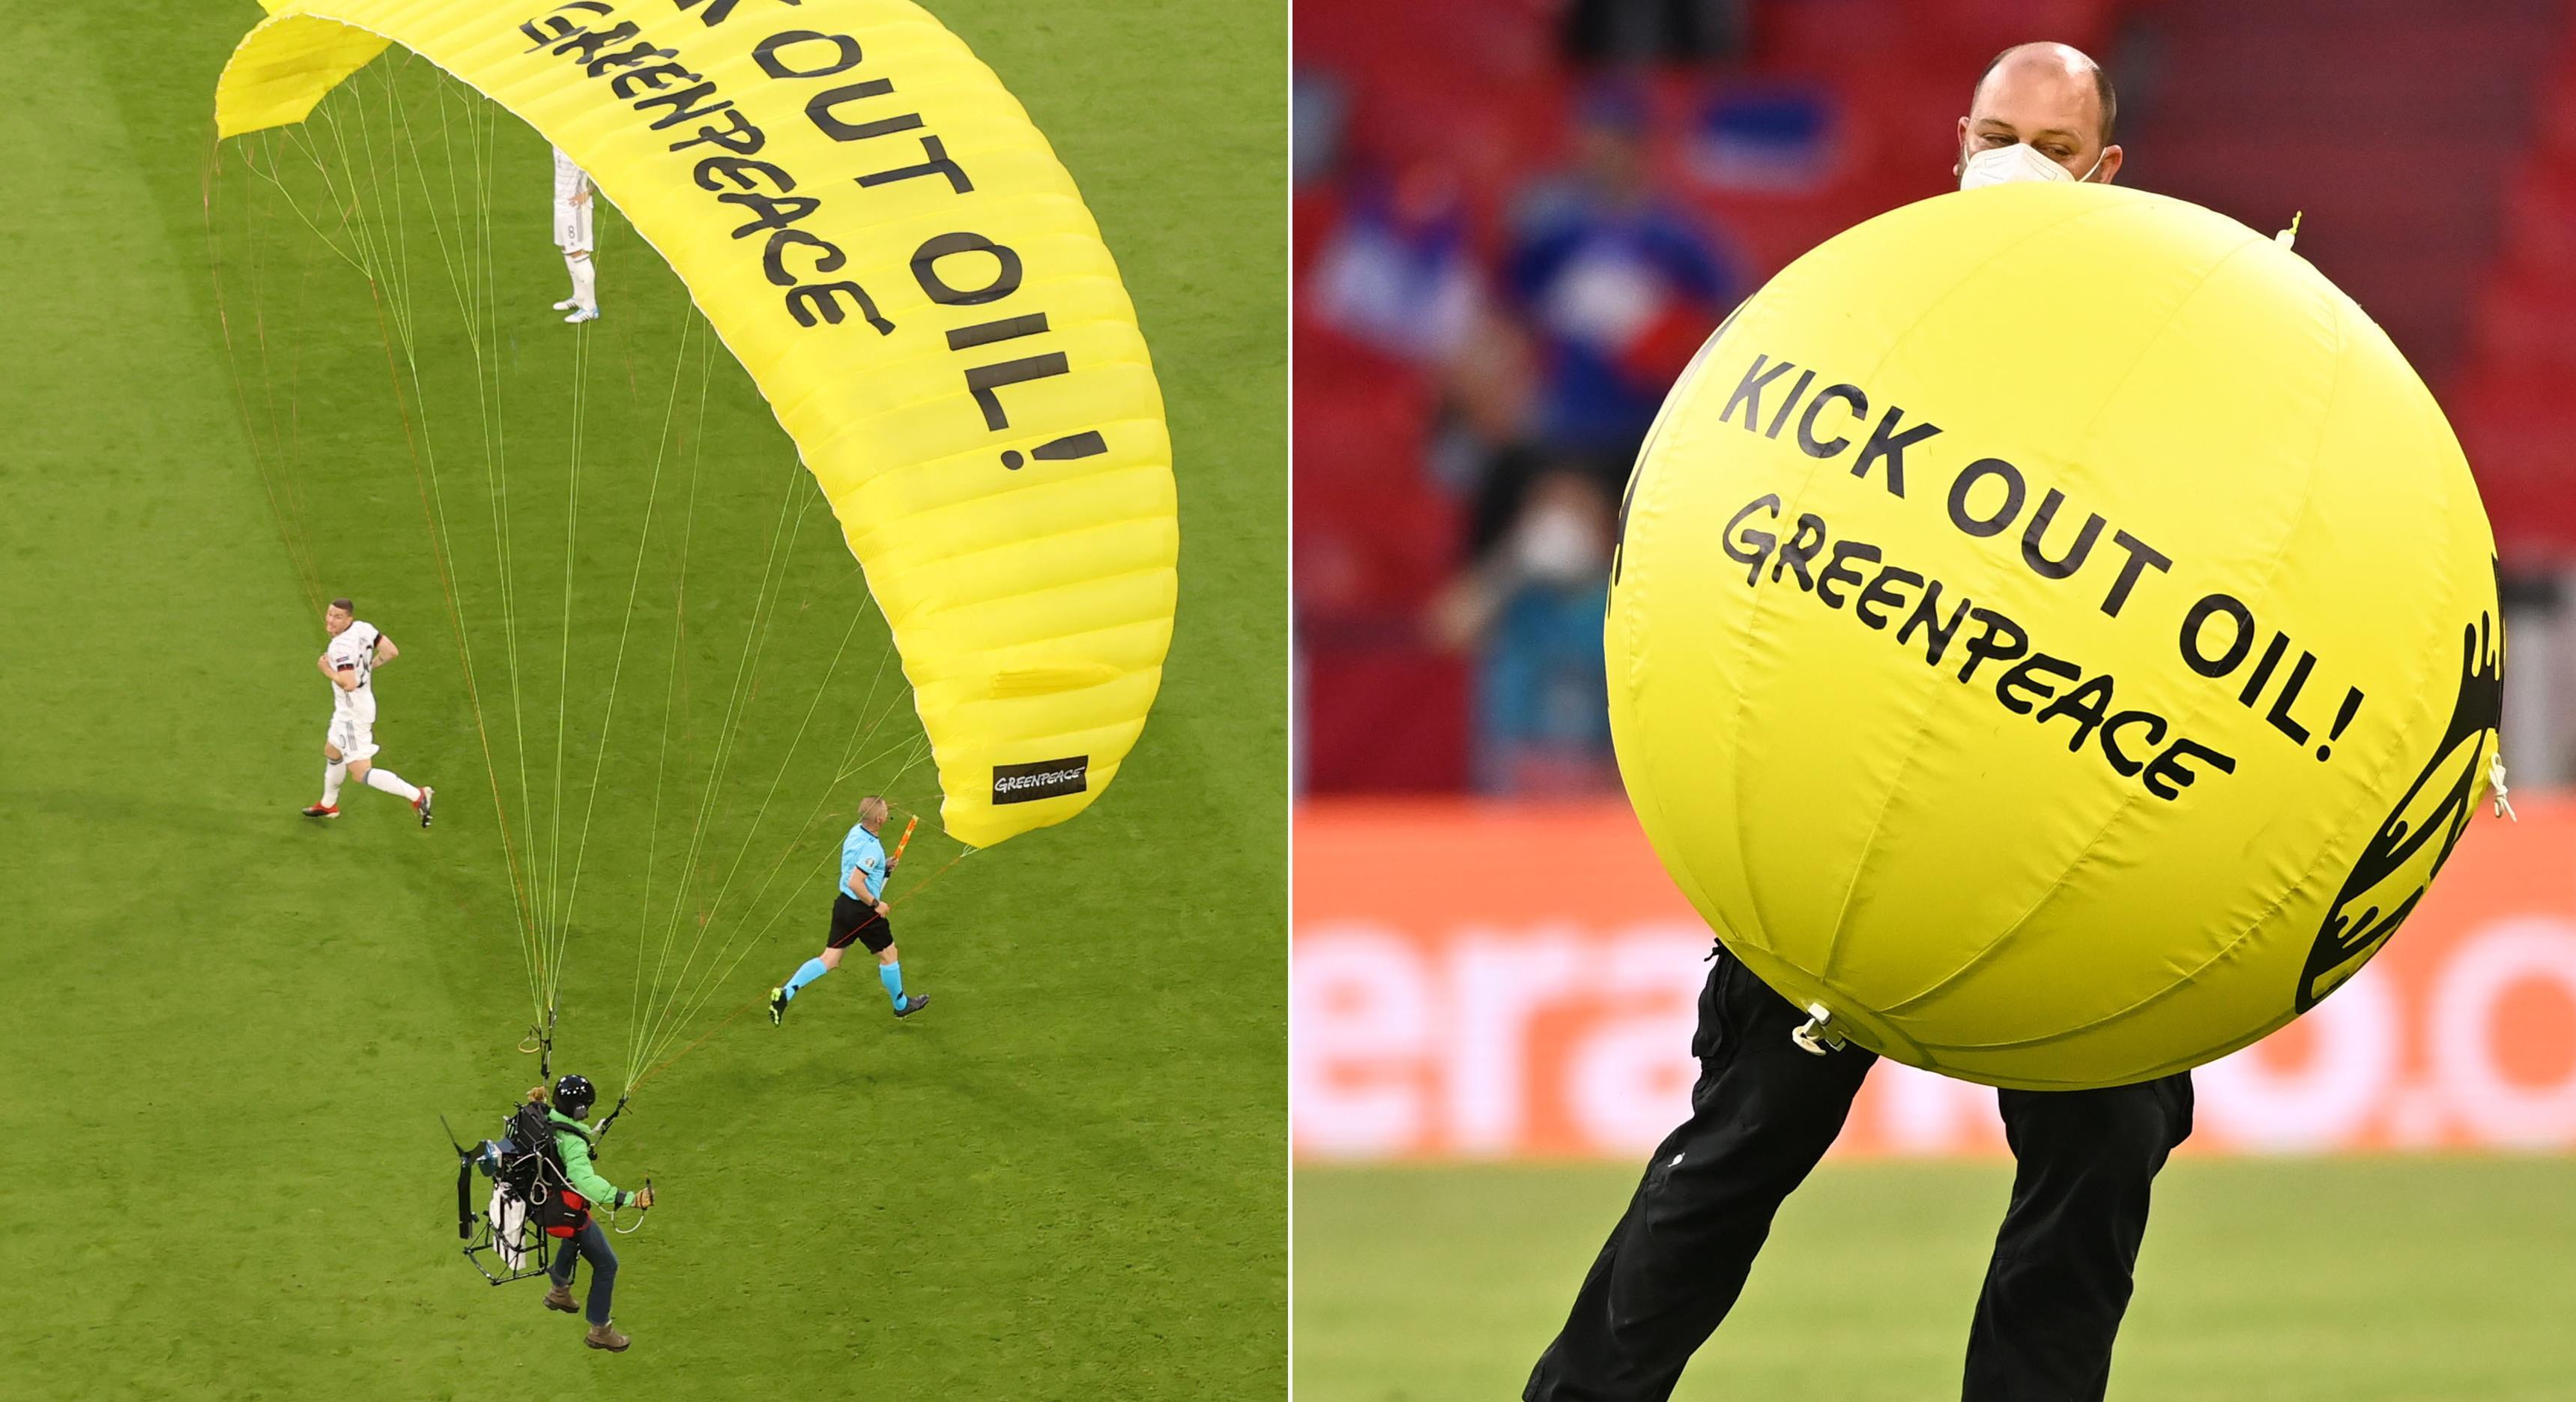 Greenpeace ber om ursäkt efter fallskärmsprotest